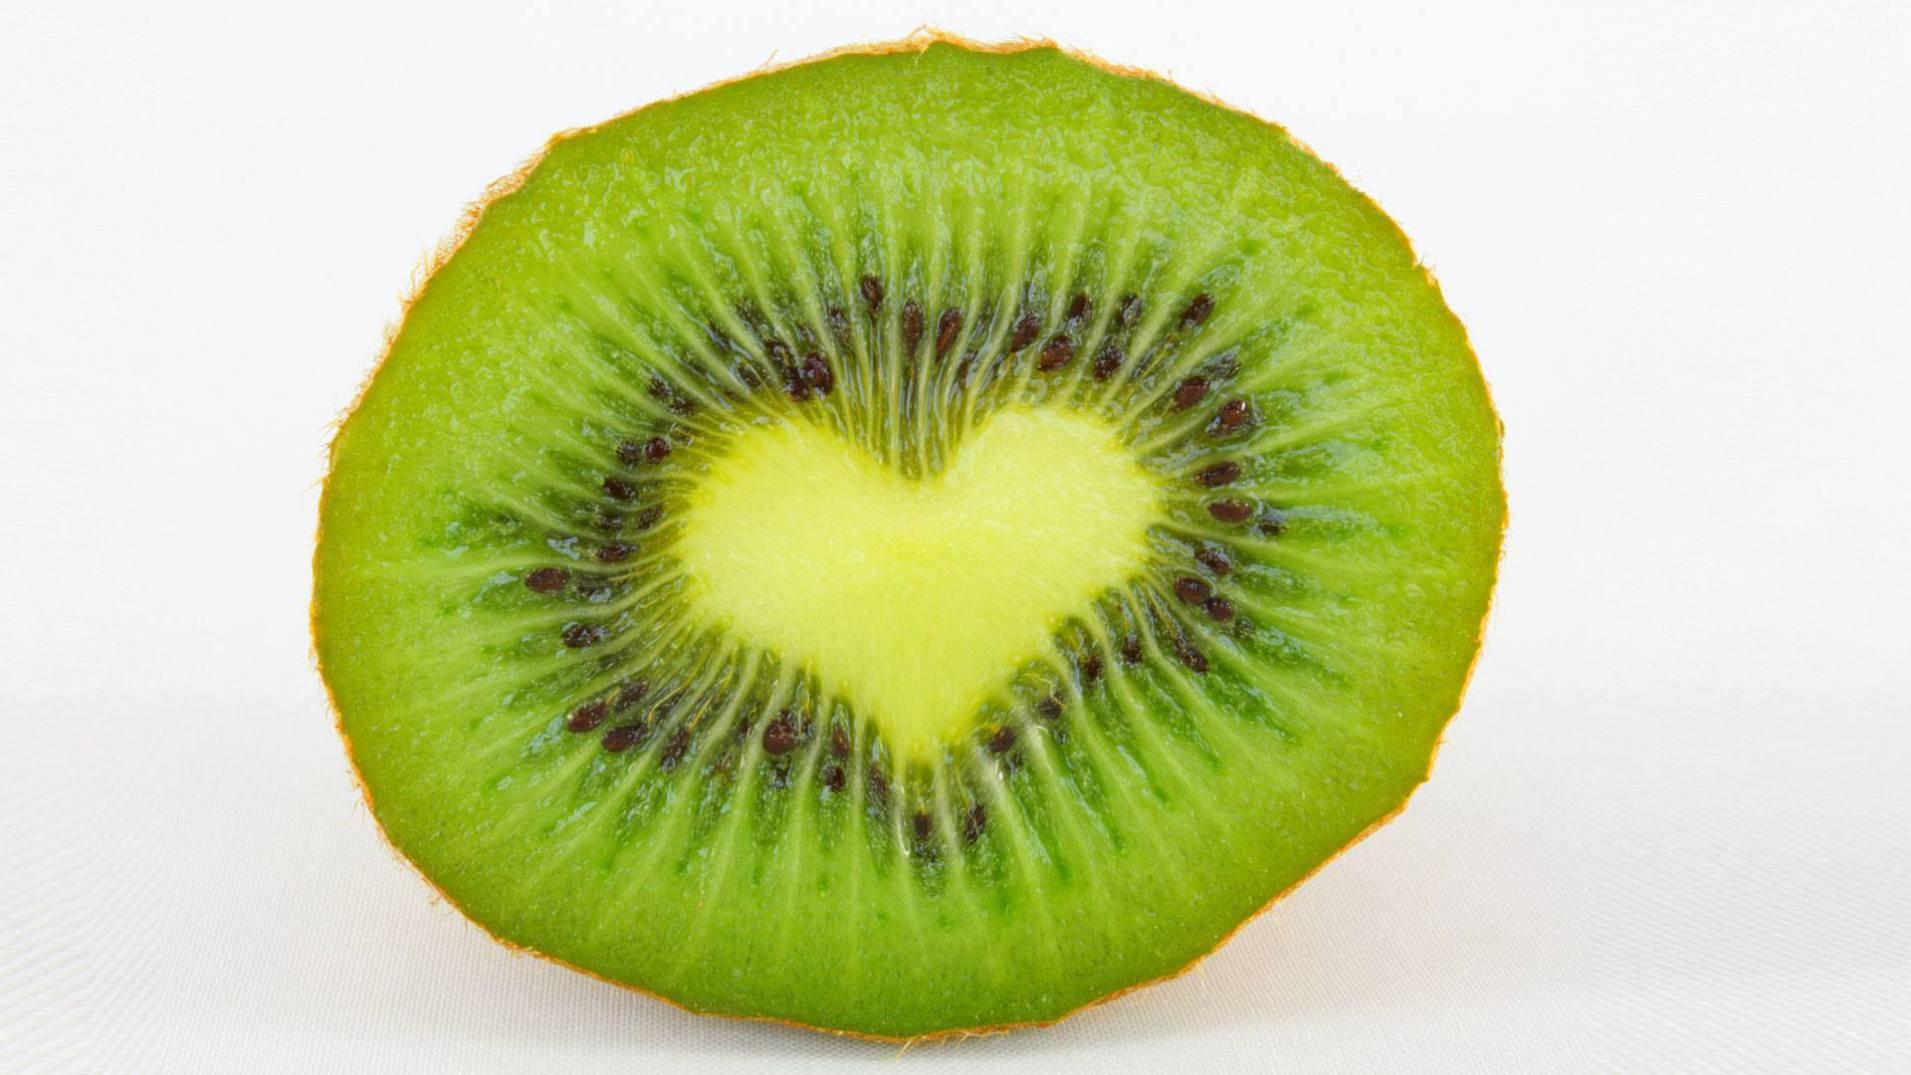 Kiwi fruit 15p in lidl